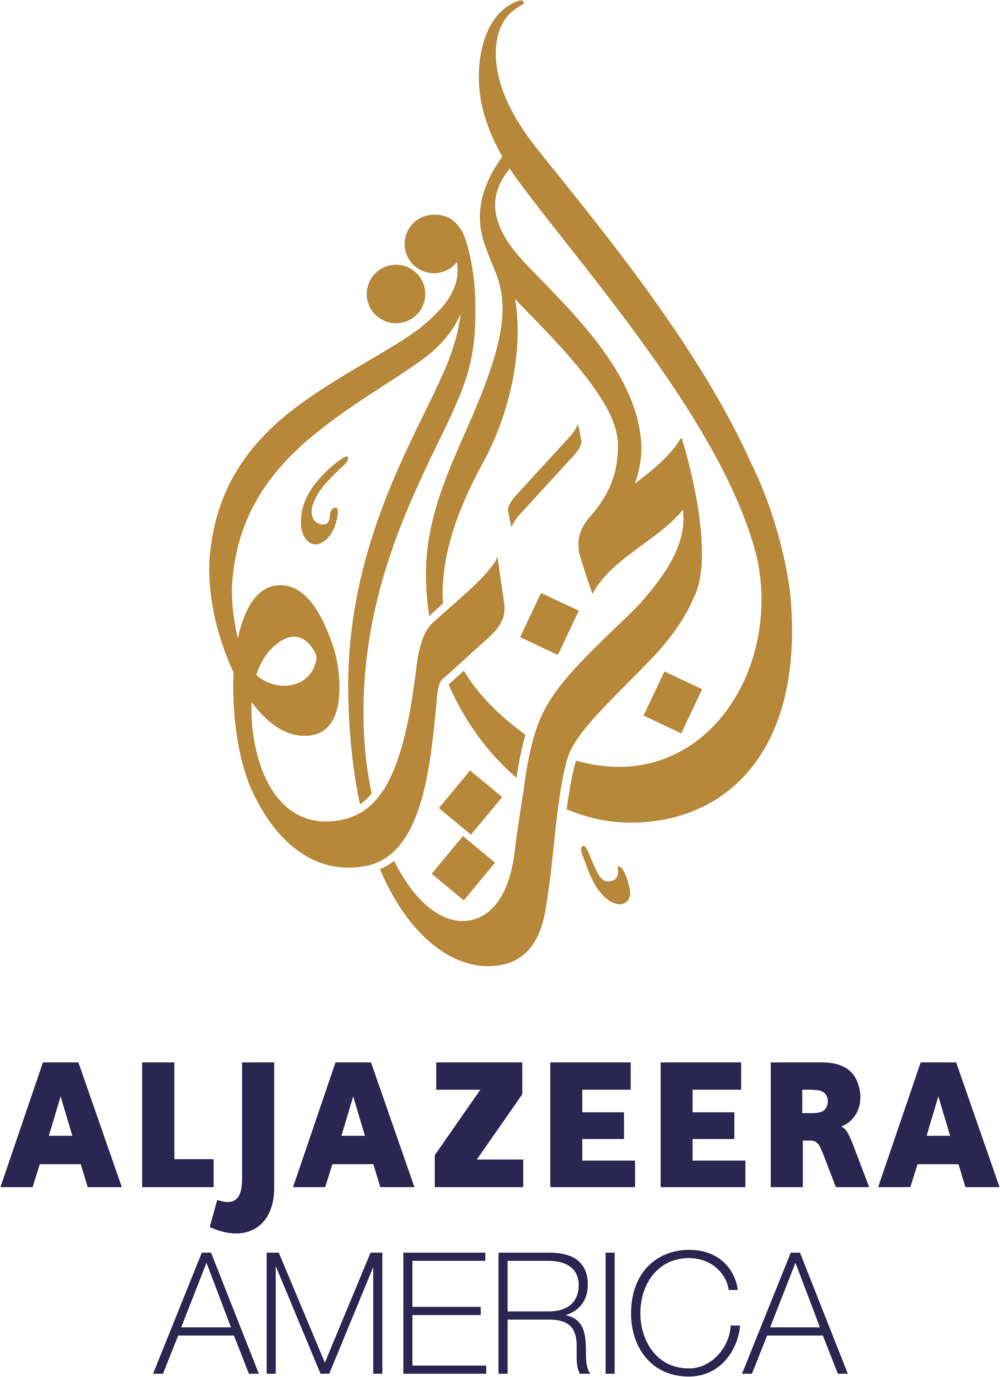 Al_Jazeera_America.png